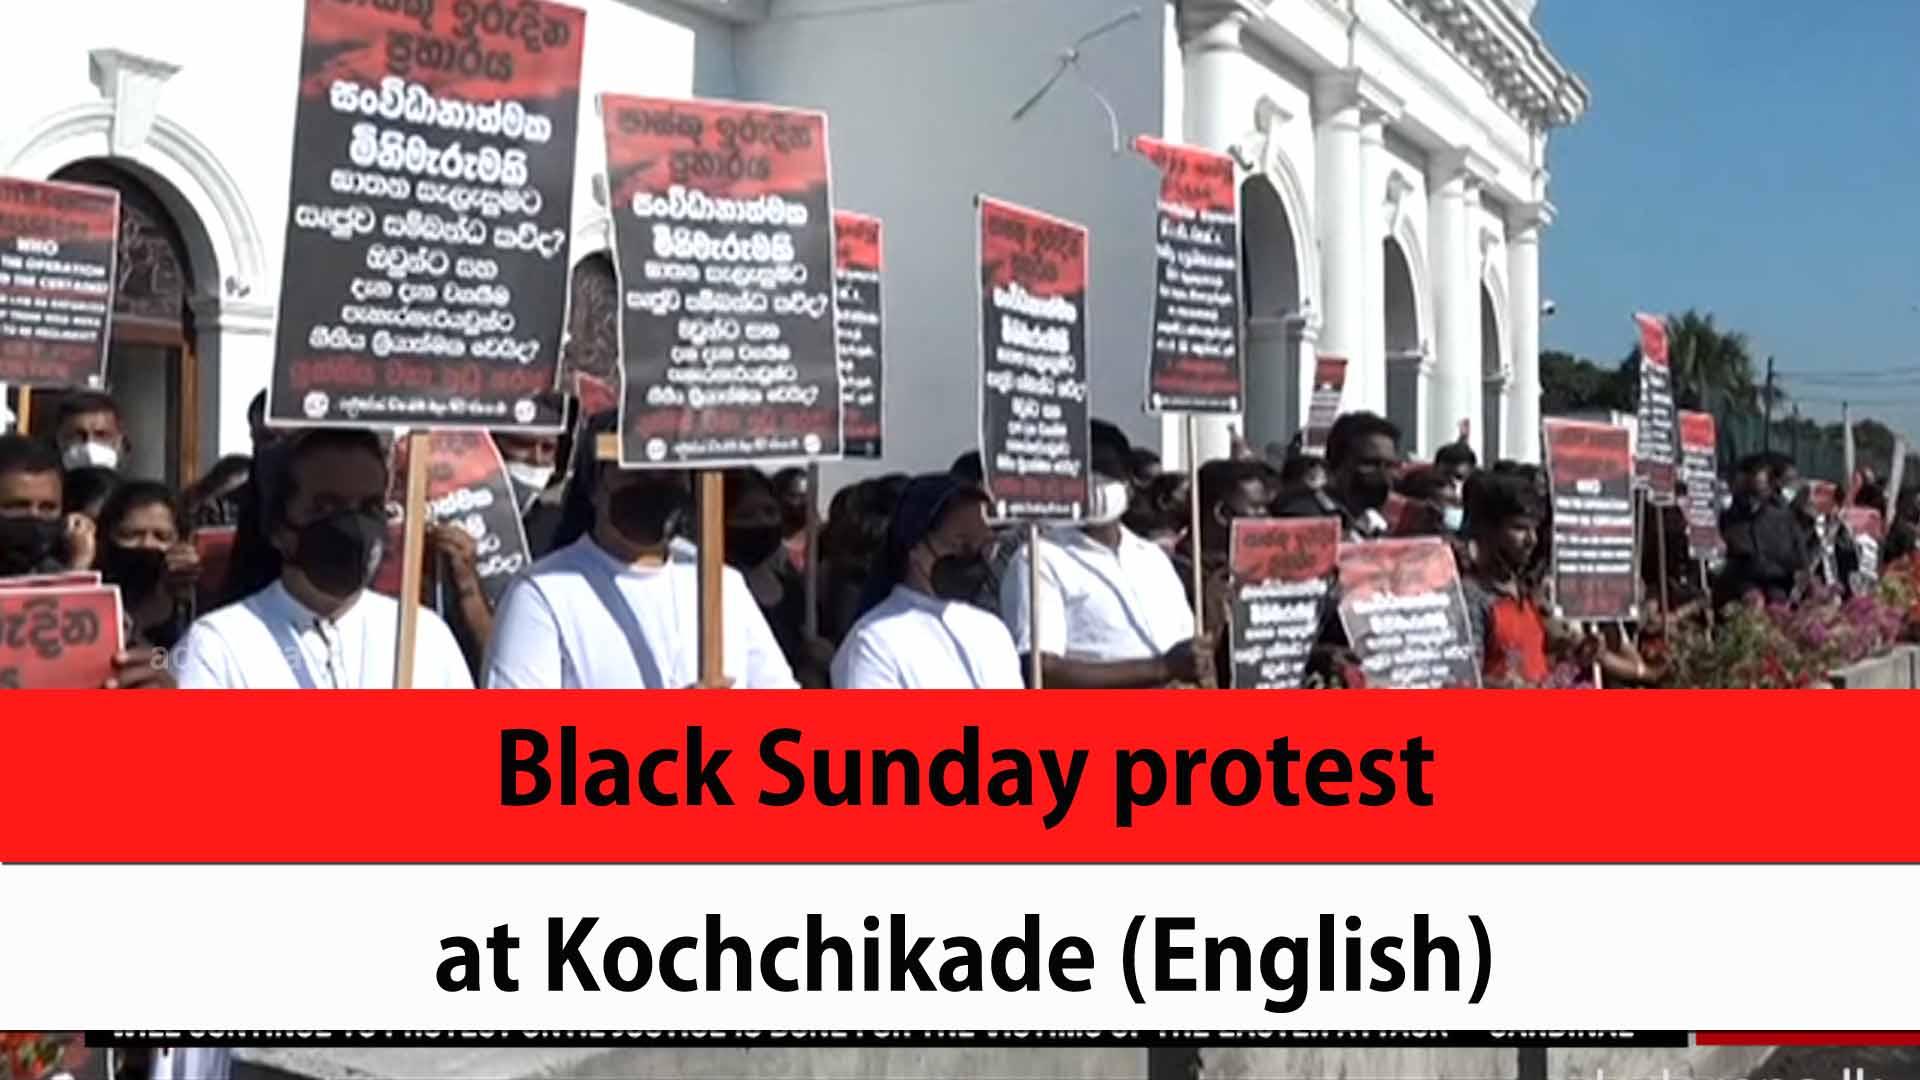 Black Sunday protest at Kochchikade (English)